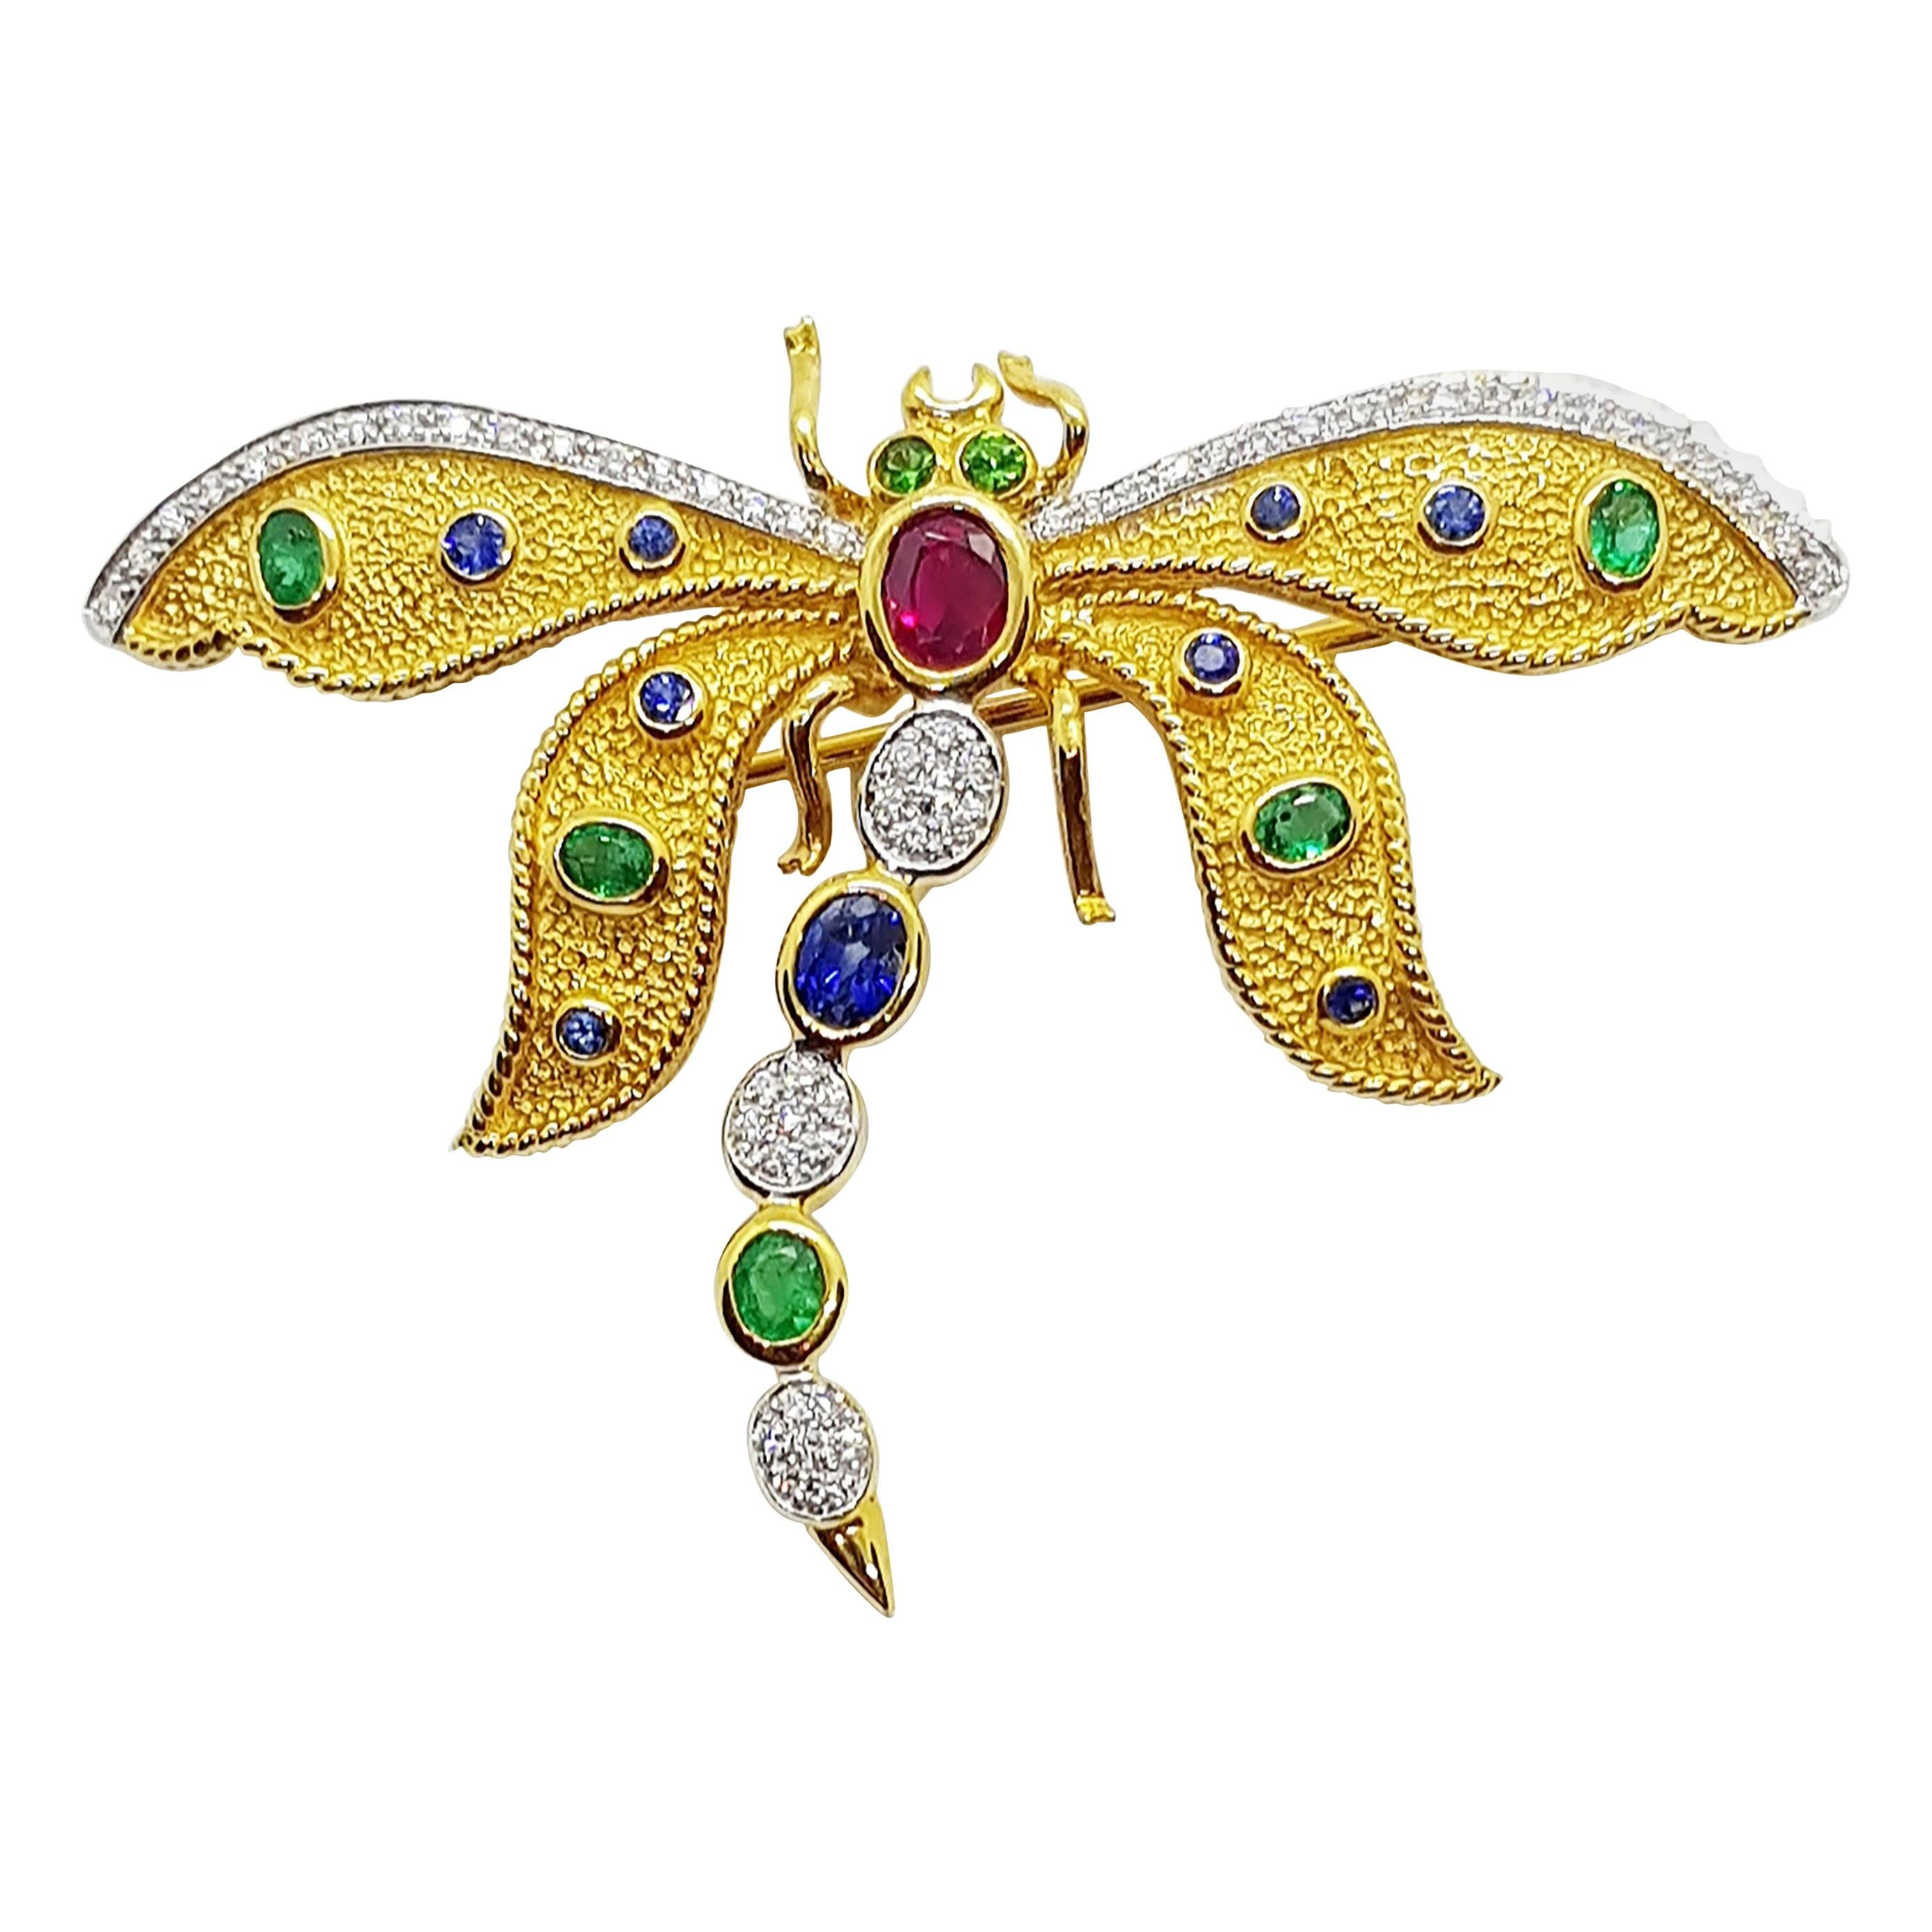 Blue Sapphire, Ruby, Emerald Dragonfly Brooch/Pendant Set in 18 Karat Gold